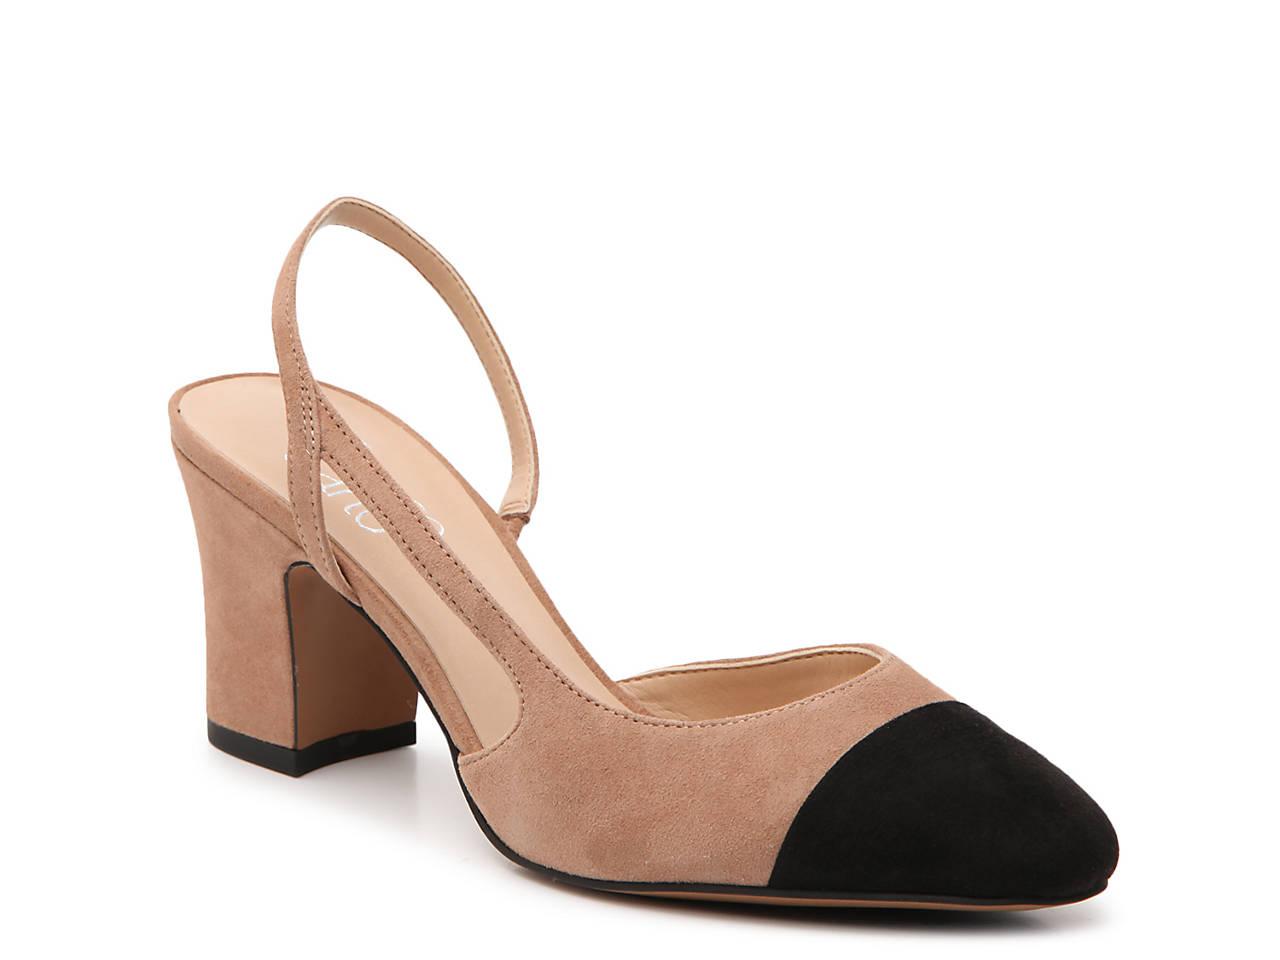 c4cbc8d1dd759b Franco Sarto Imogen Pump Women s Shoes